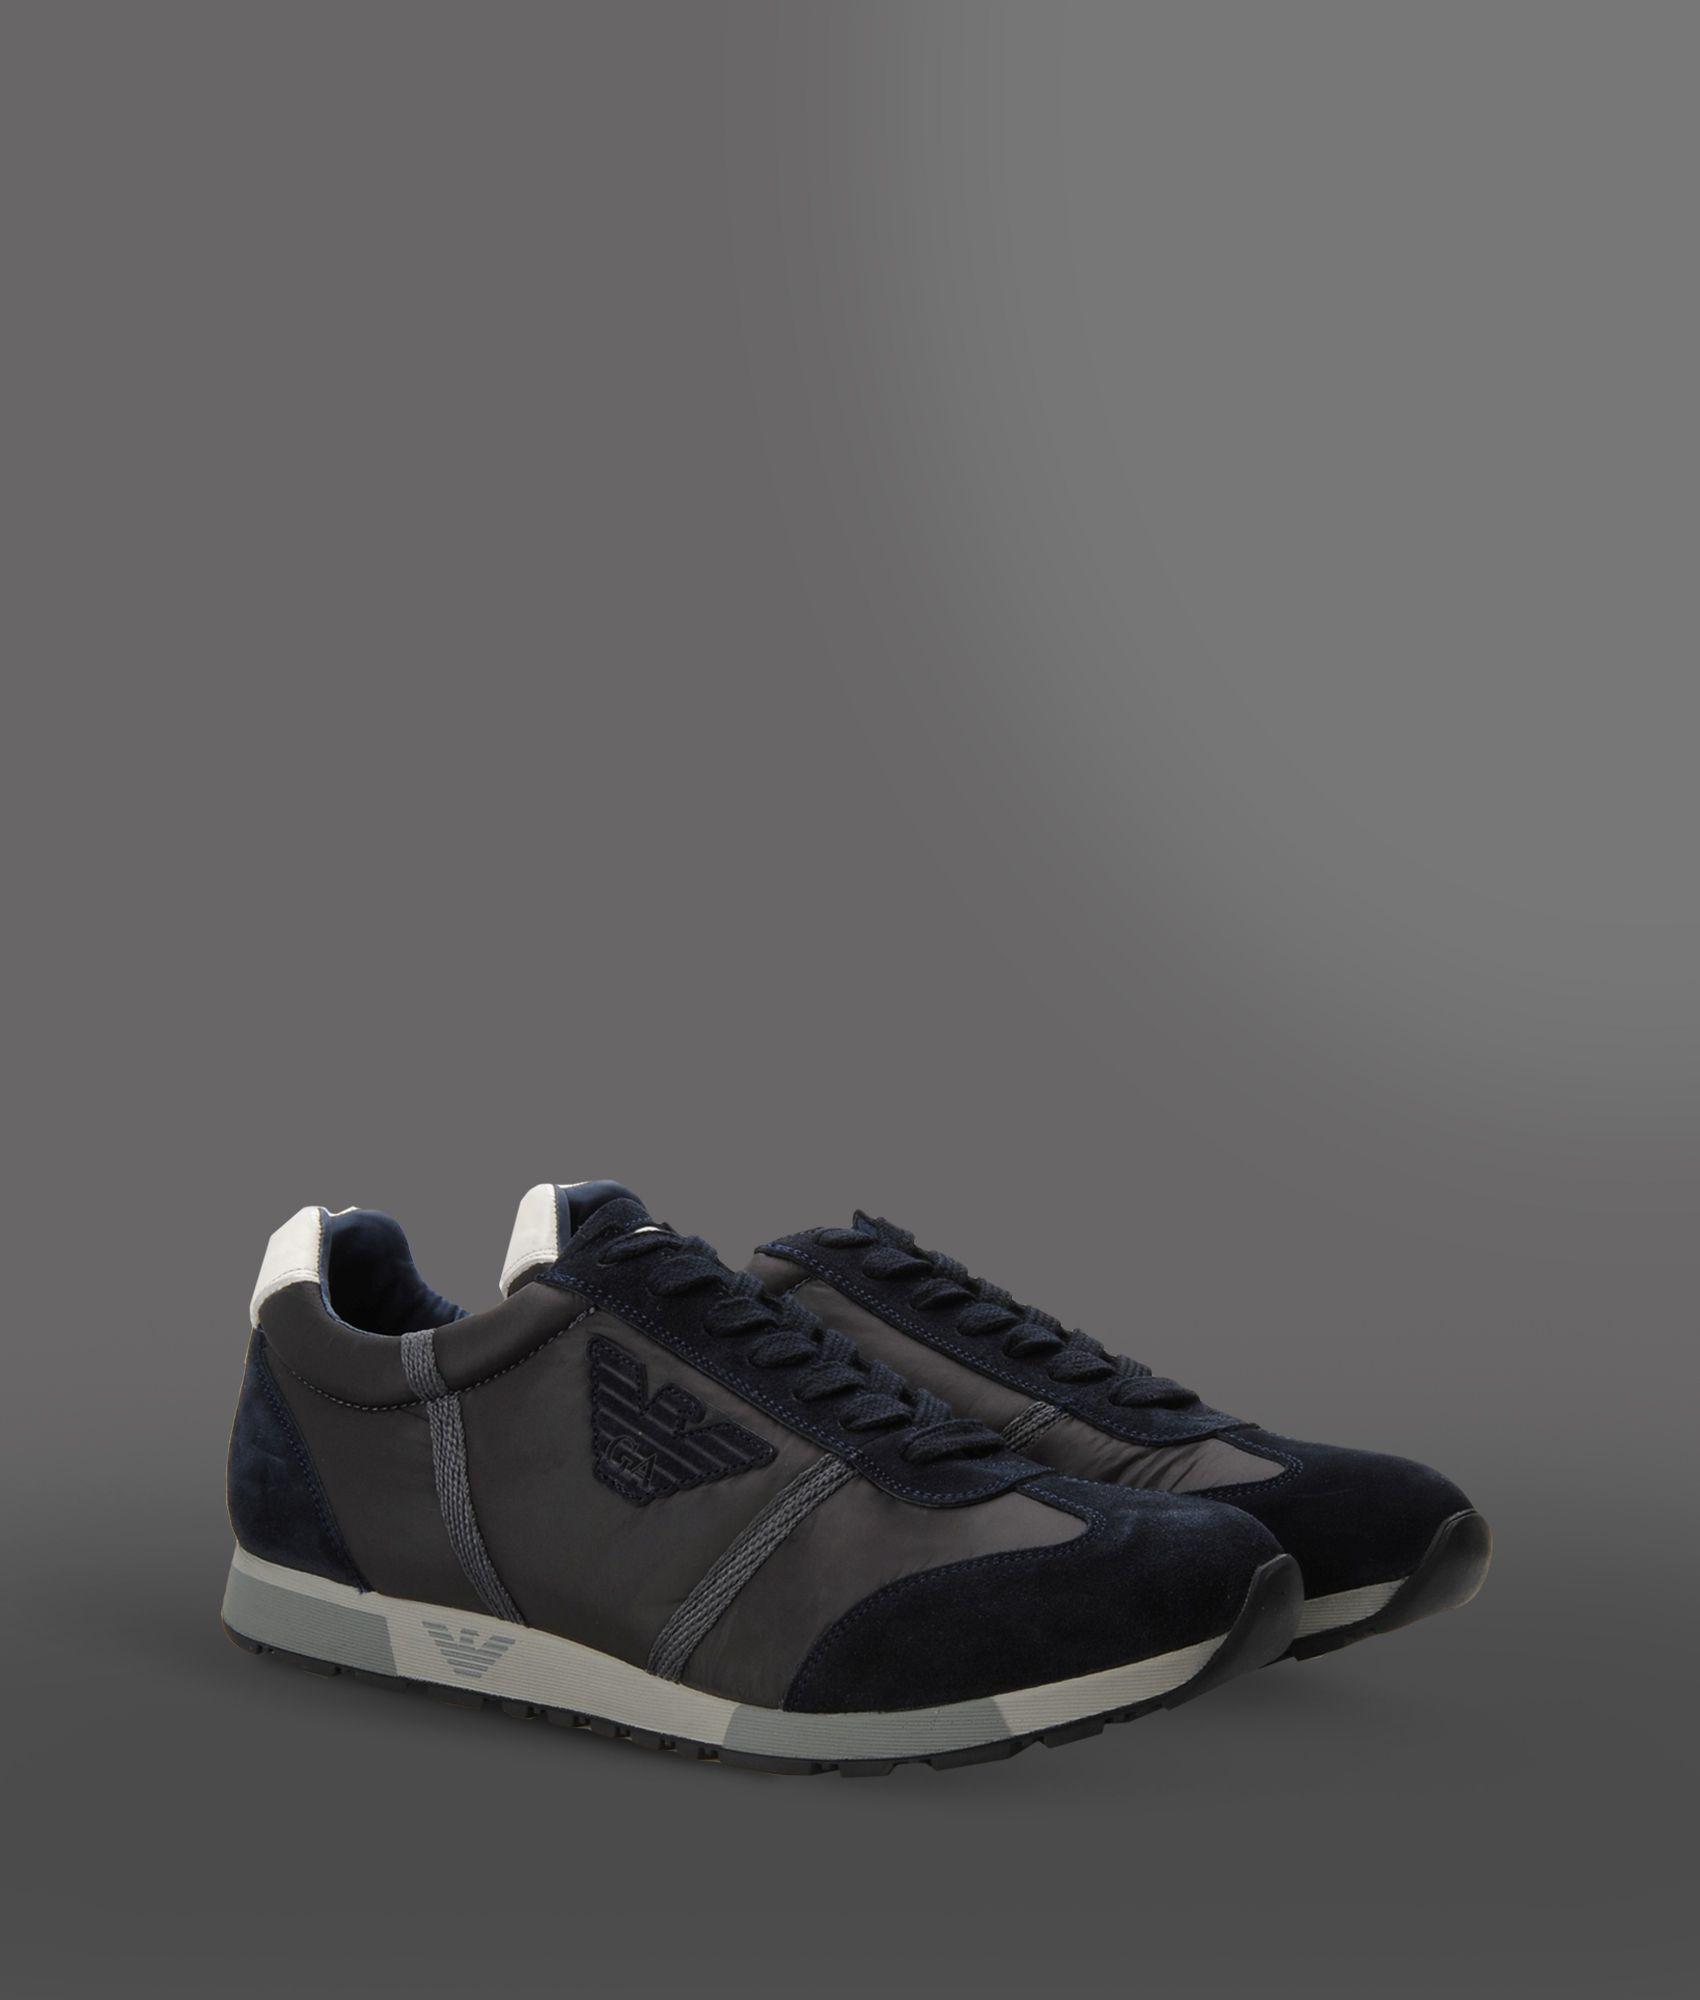 Emporio Armani Trainers - black/blue/grey QFiVmE